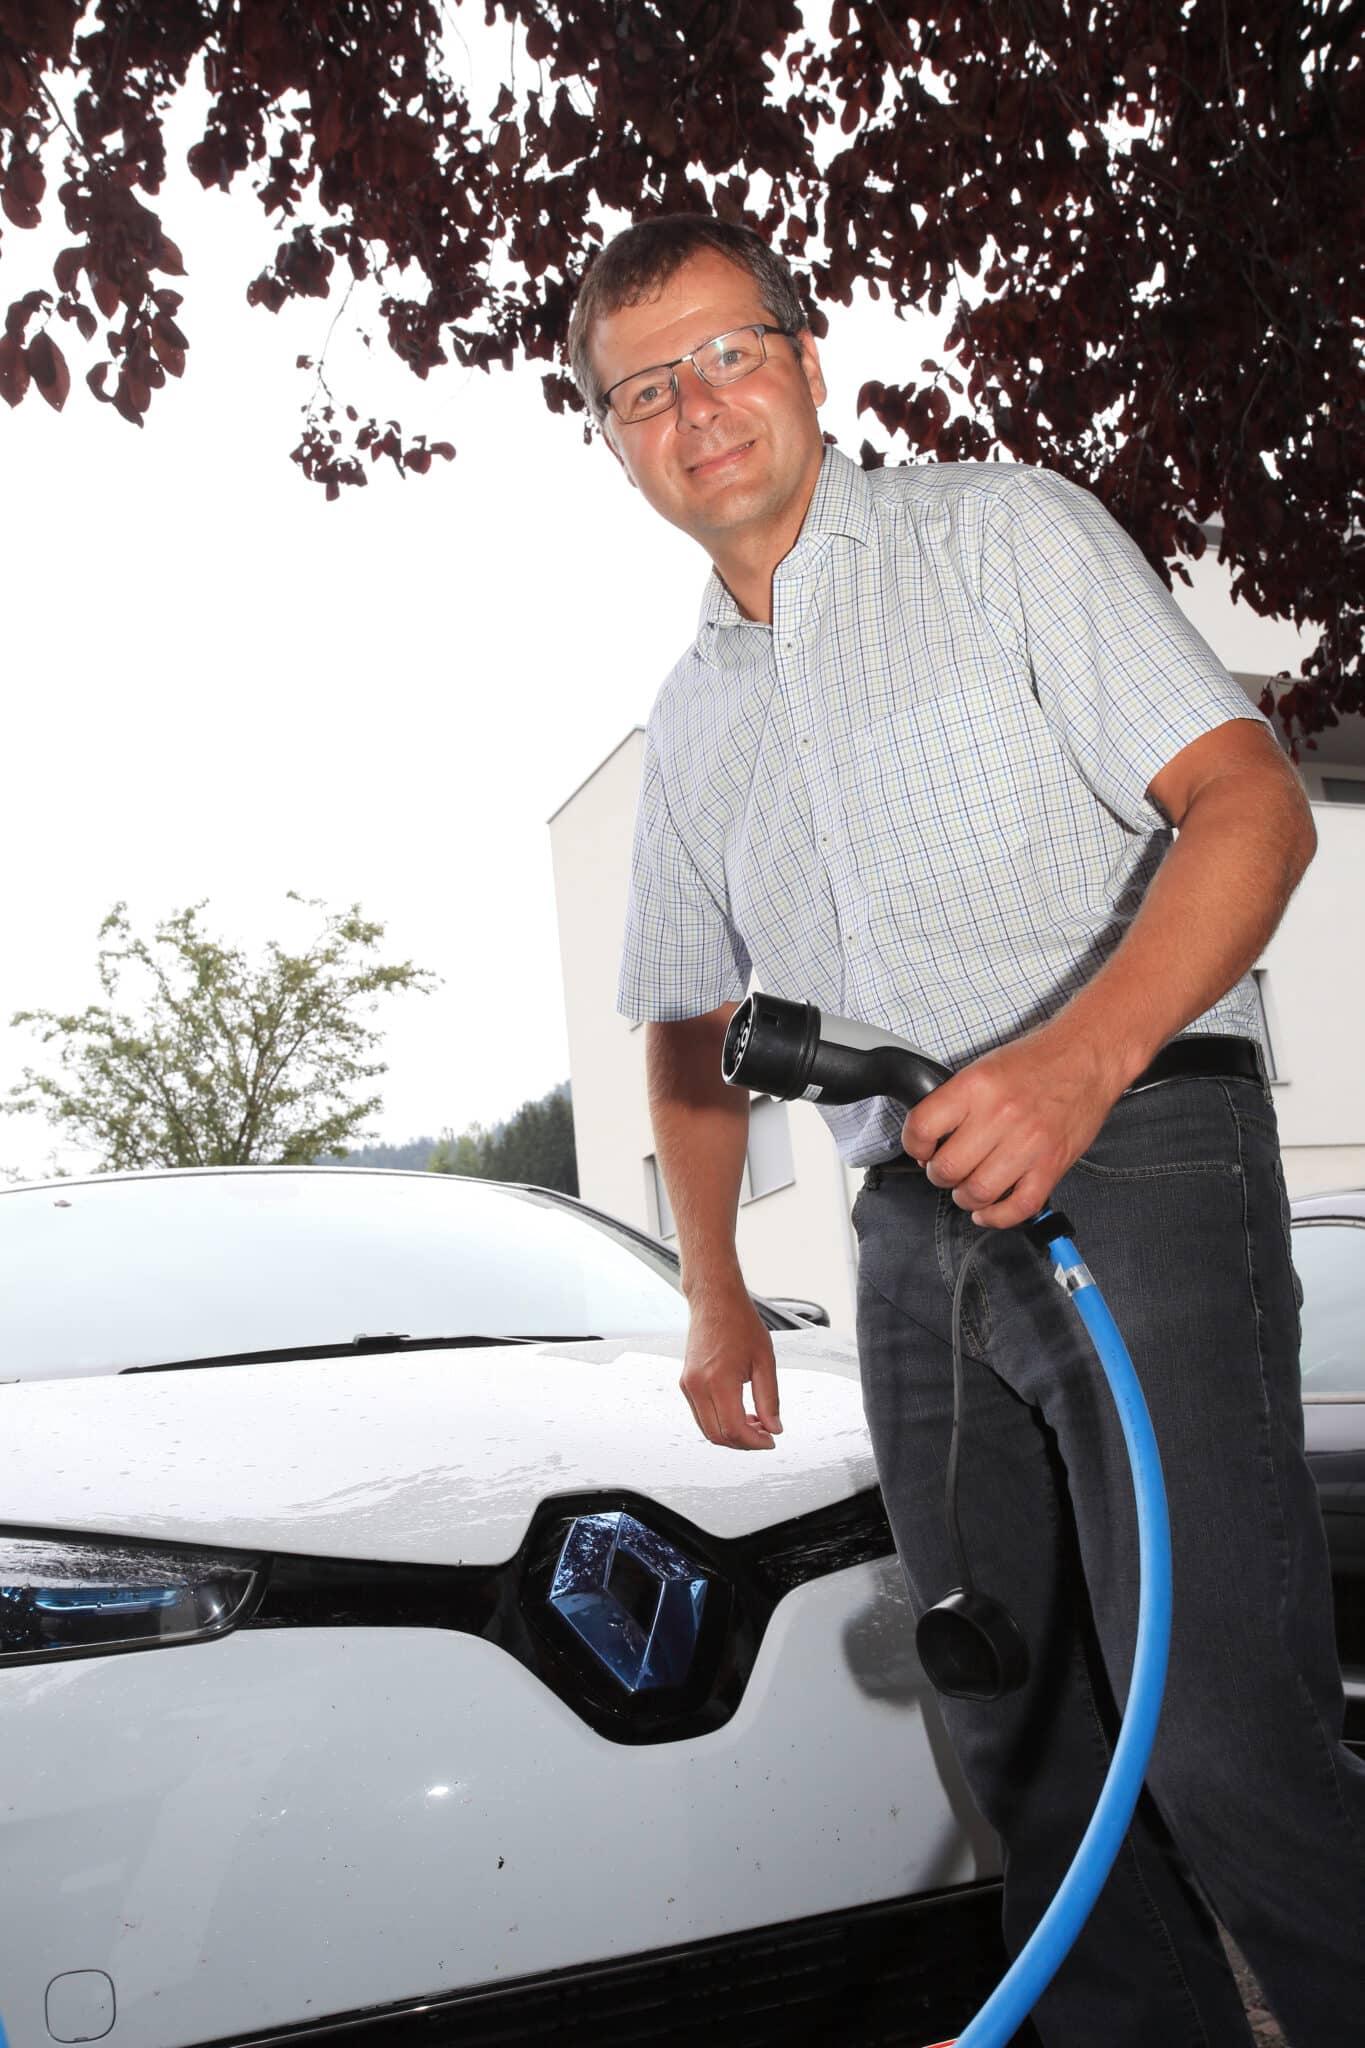 eMobility – Kompetenztreffen Livestream WIEN – September » DI Bernhard Reinitzhuber scaled